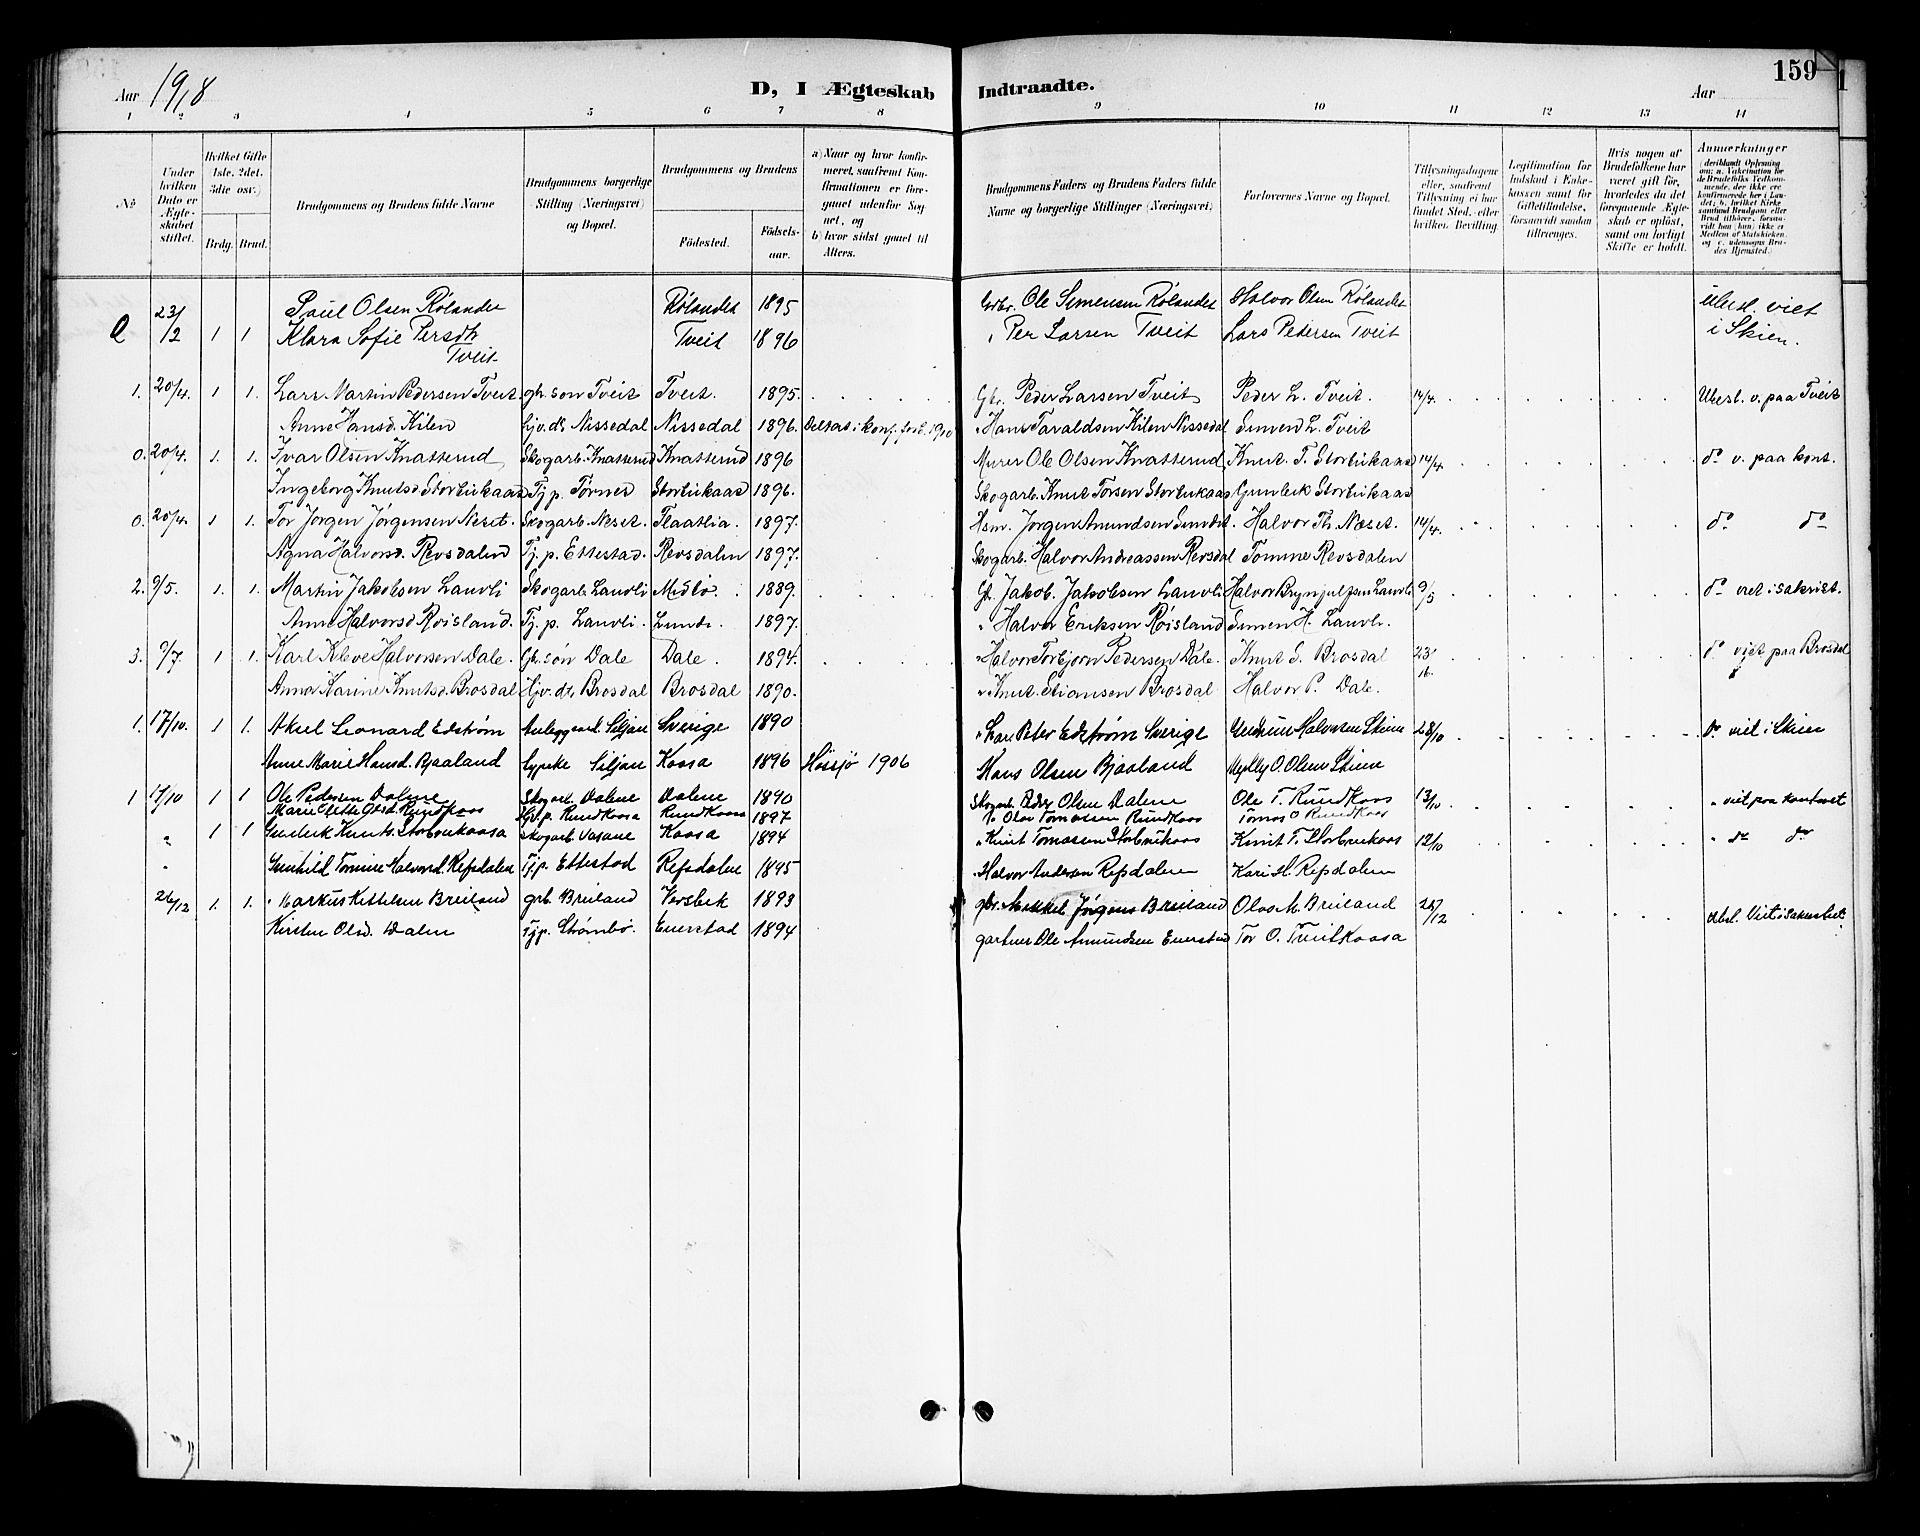 SAKO, Drangedal kirkebøker, G/Gb/L0002: Klokkerbok nr. II 2, 1895-1918, s. 159